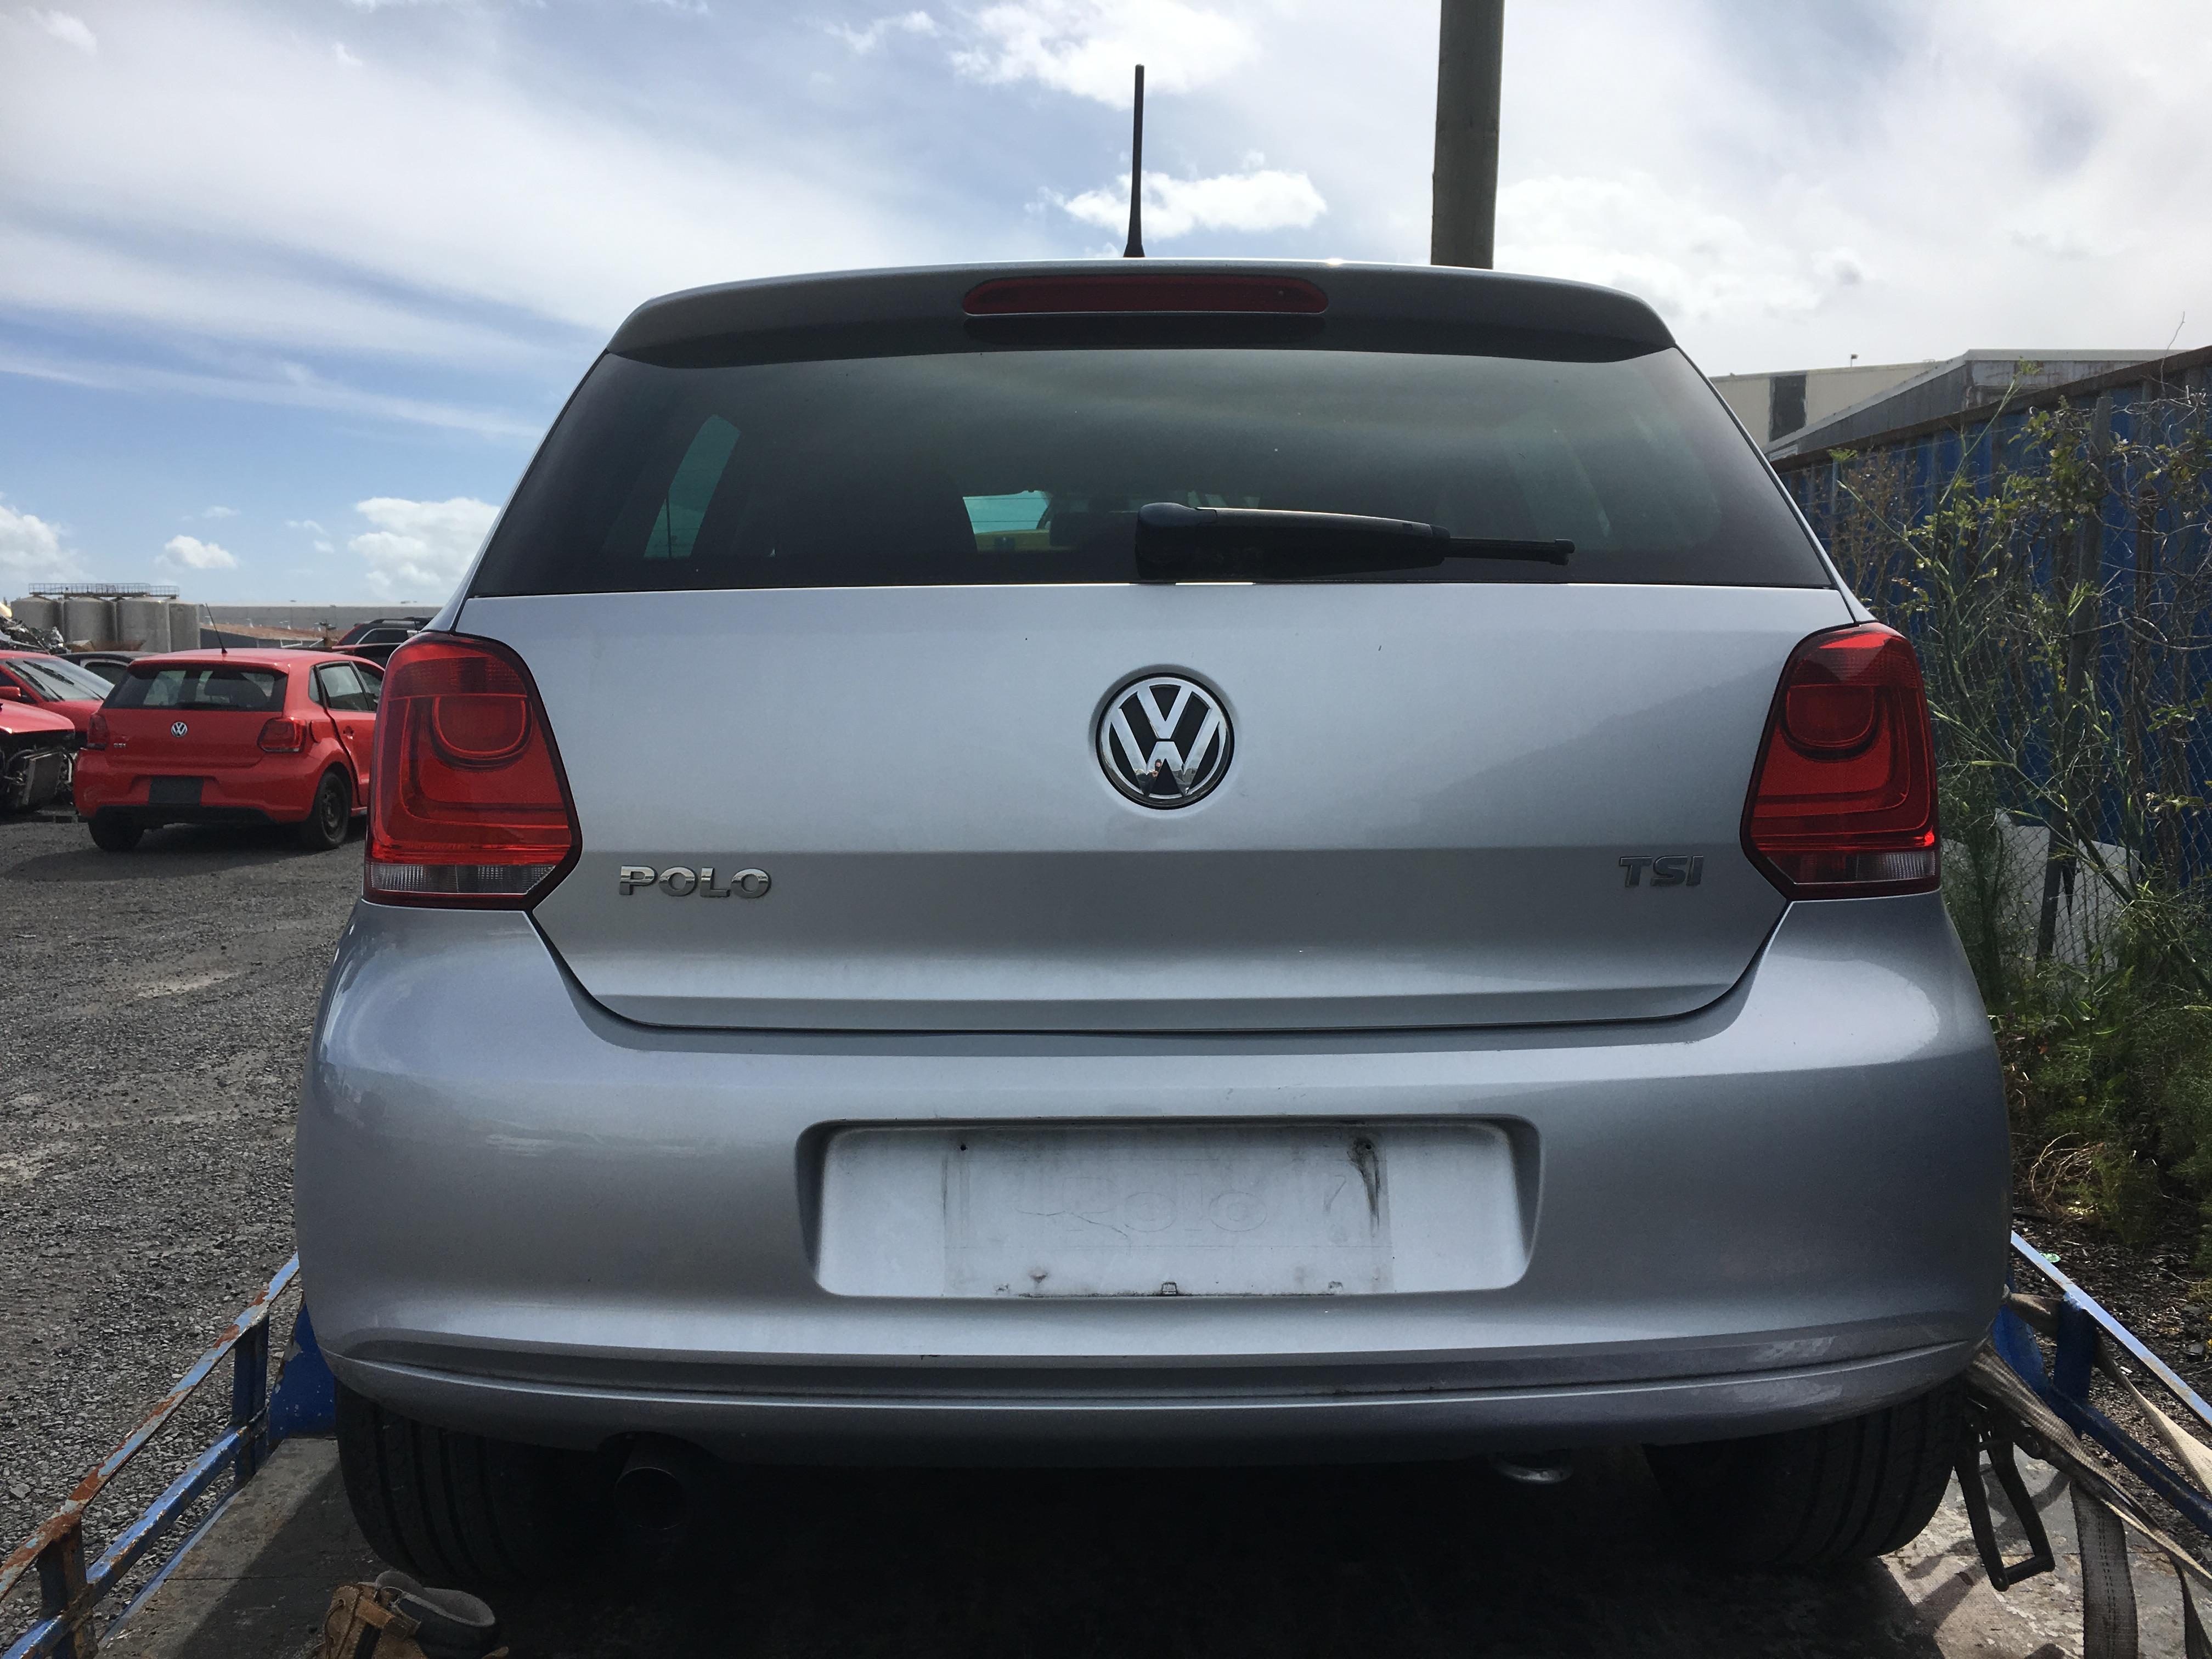 VW Polo 2012 6R